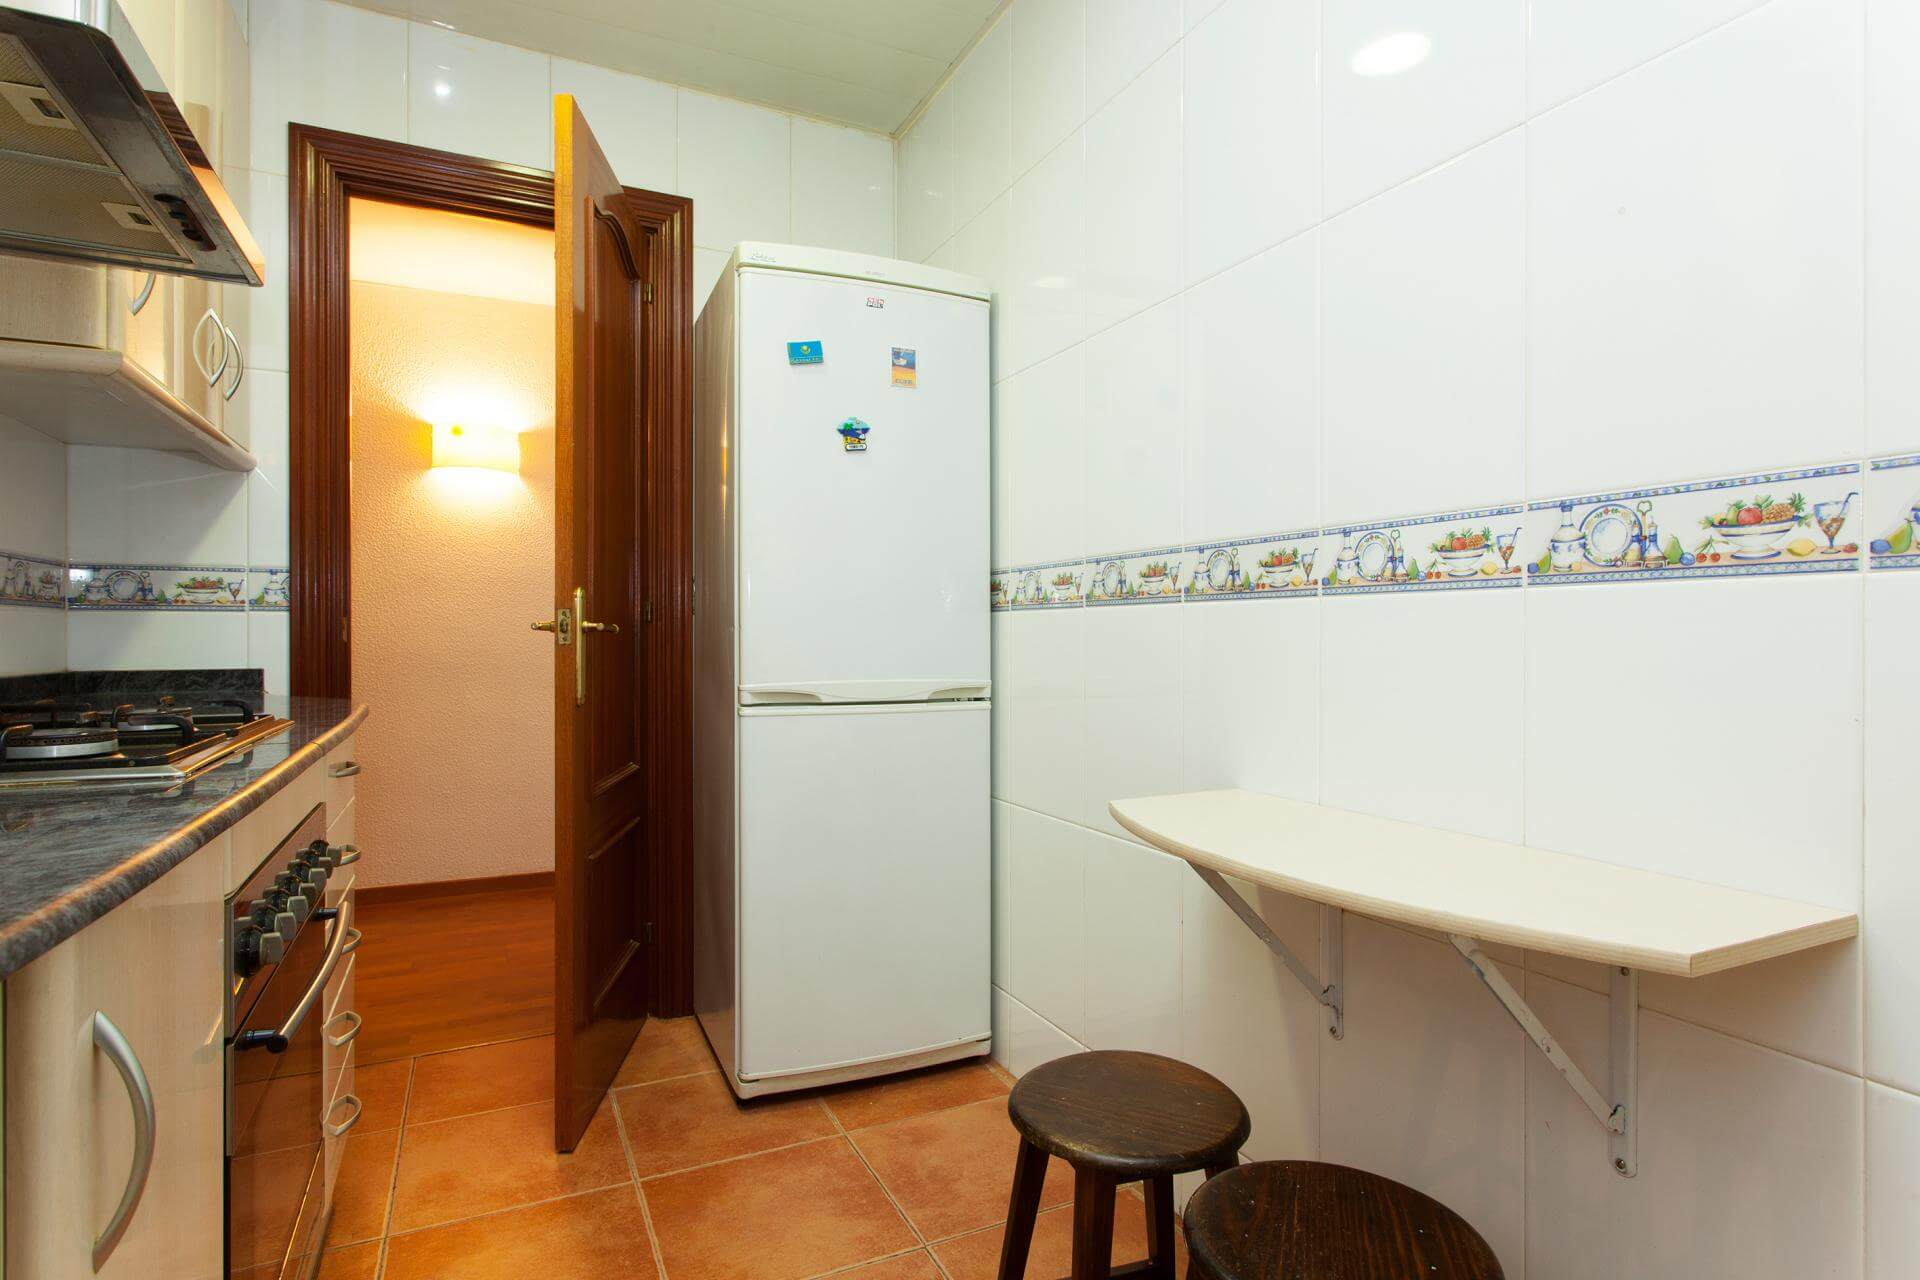 shbarcelona appartement meubl en location longue dur e. Black Bedroom Furniture Sets. Home Design Ideas